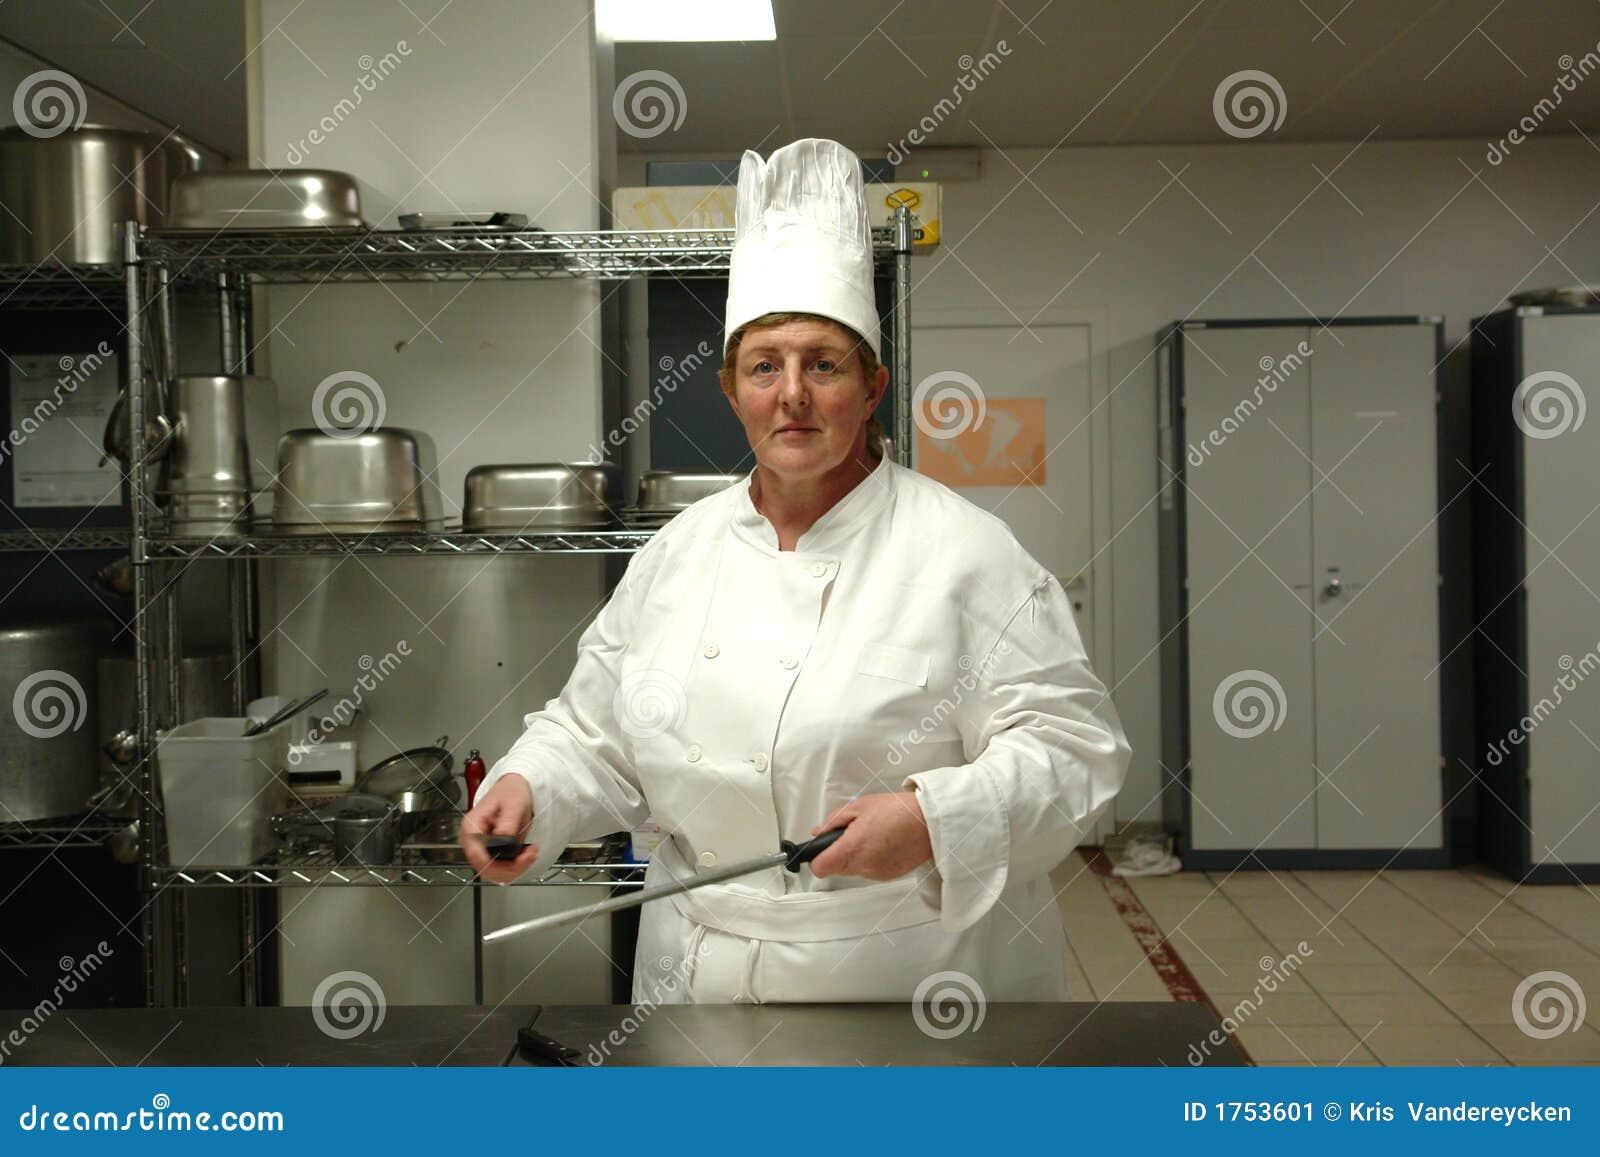 chef sharpening the knives stock image image 1753601. Black Bedroom Furniture Sets. Home Design Ideas